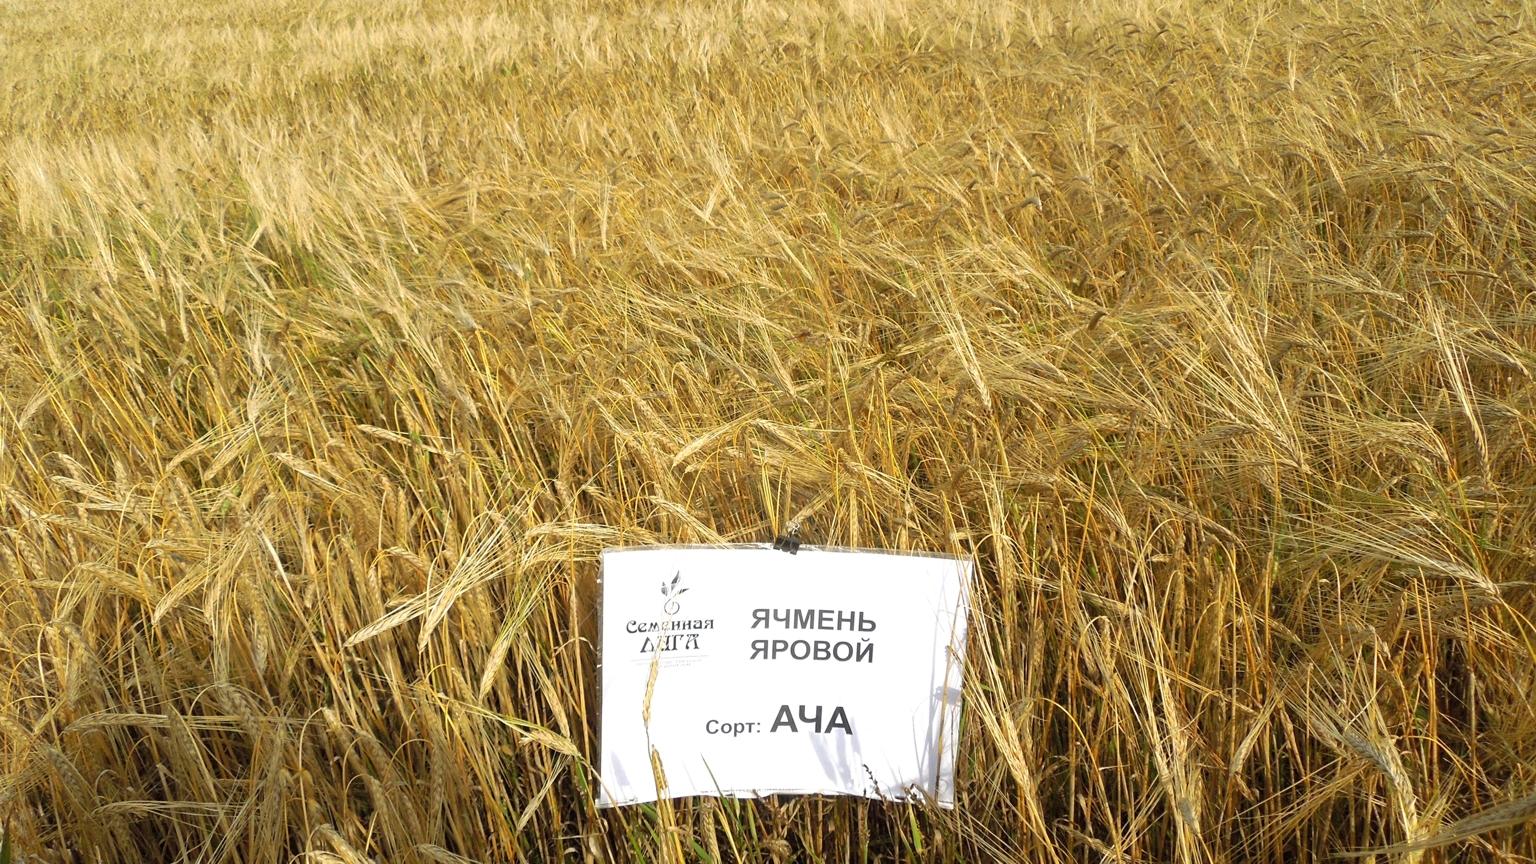 года осень купить семена овес в заб край Анапа Москва